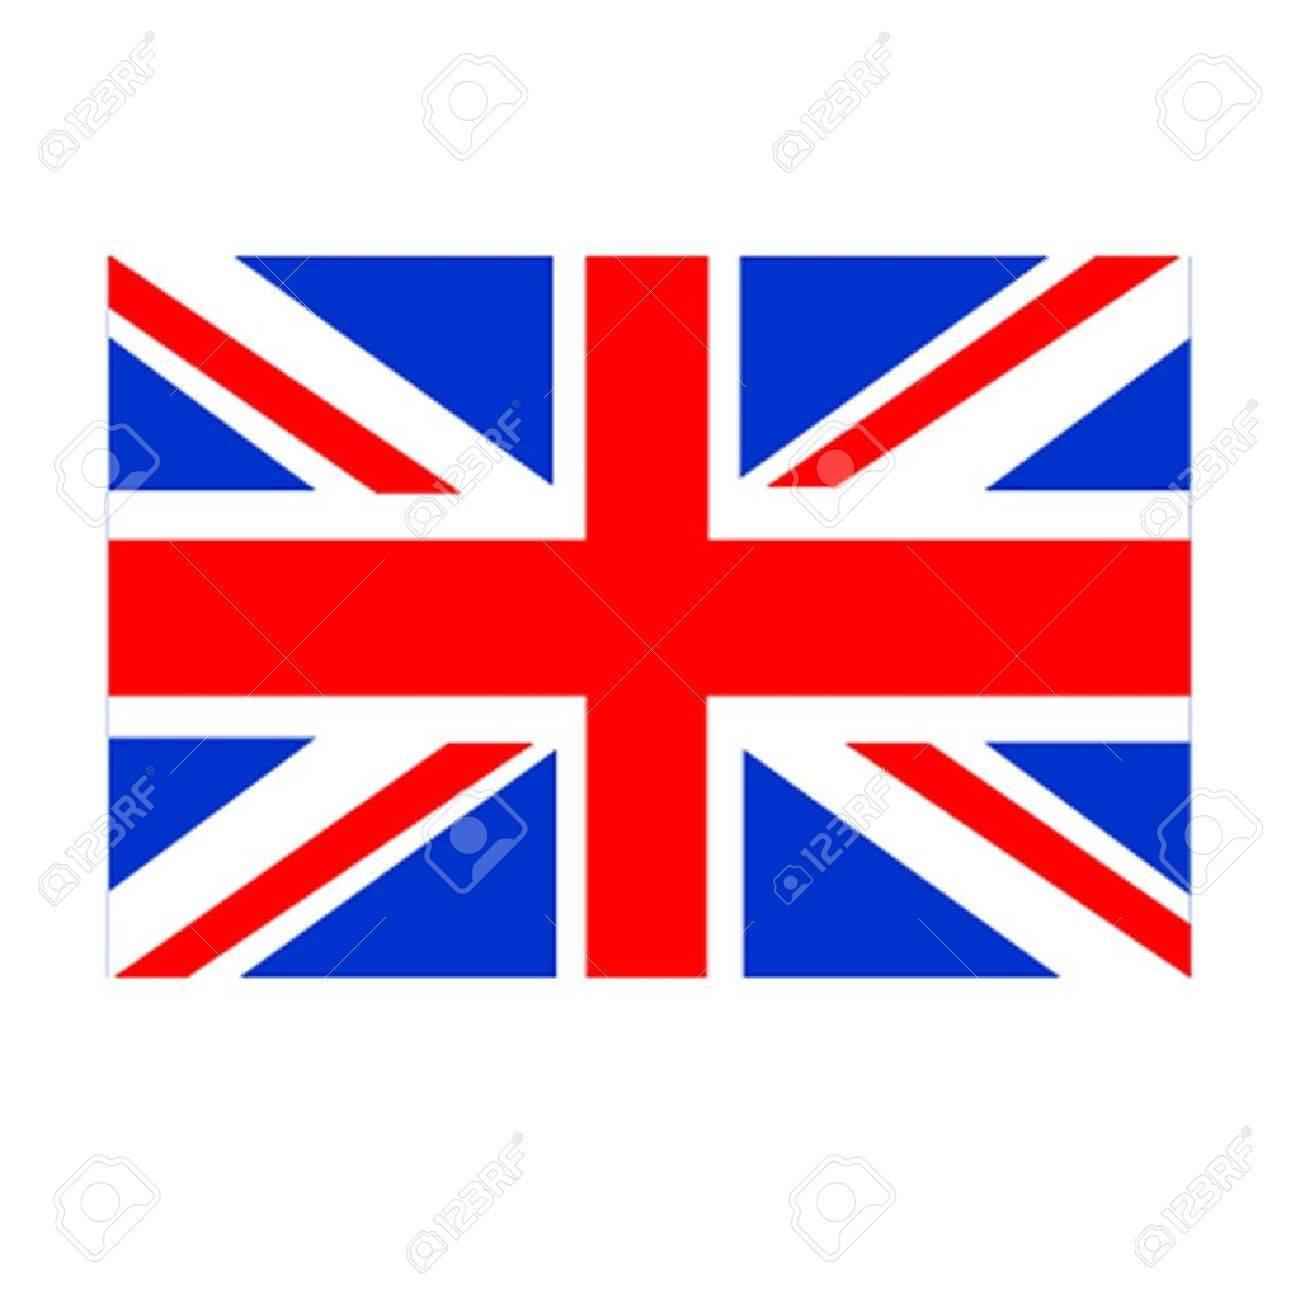 British Flag - Union Jack Stock Vector - 12028389